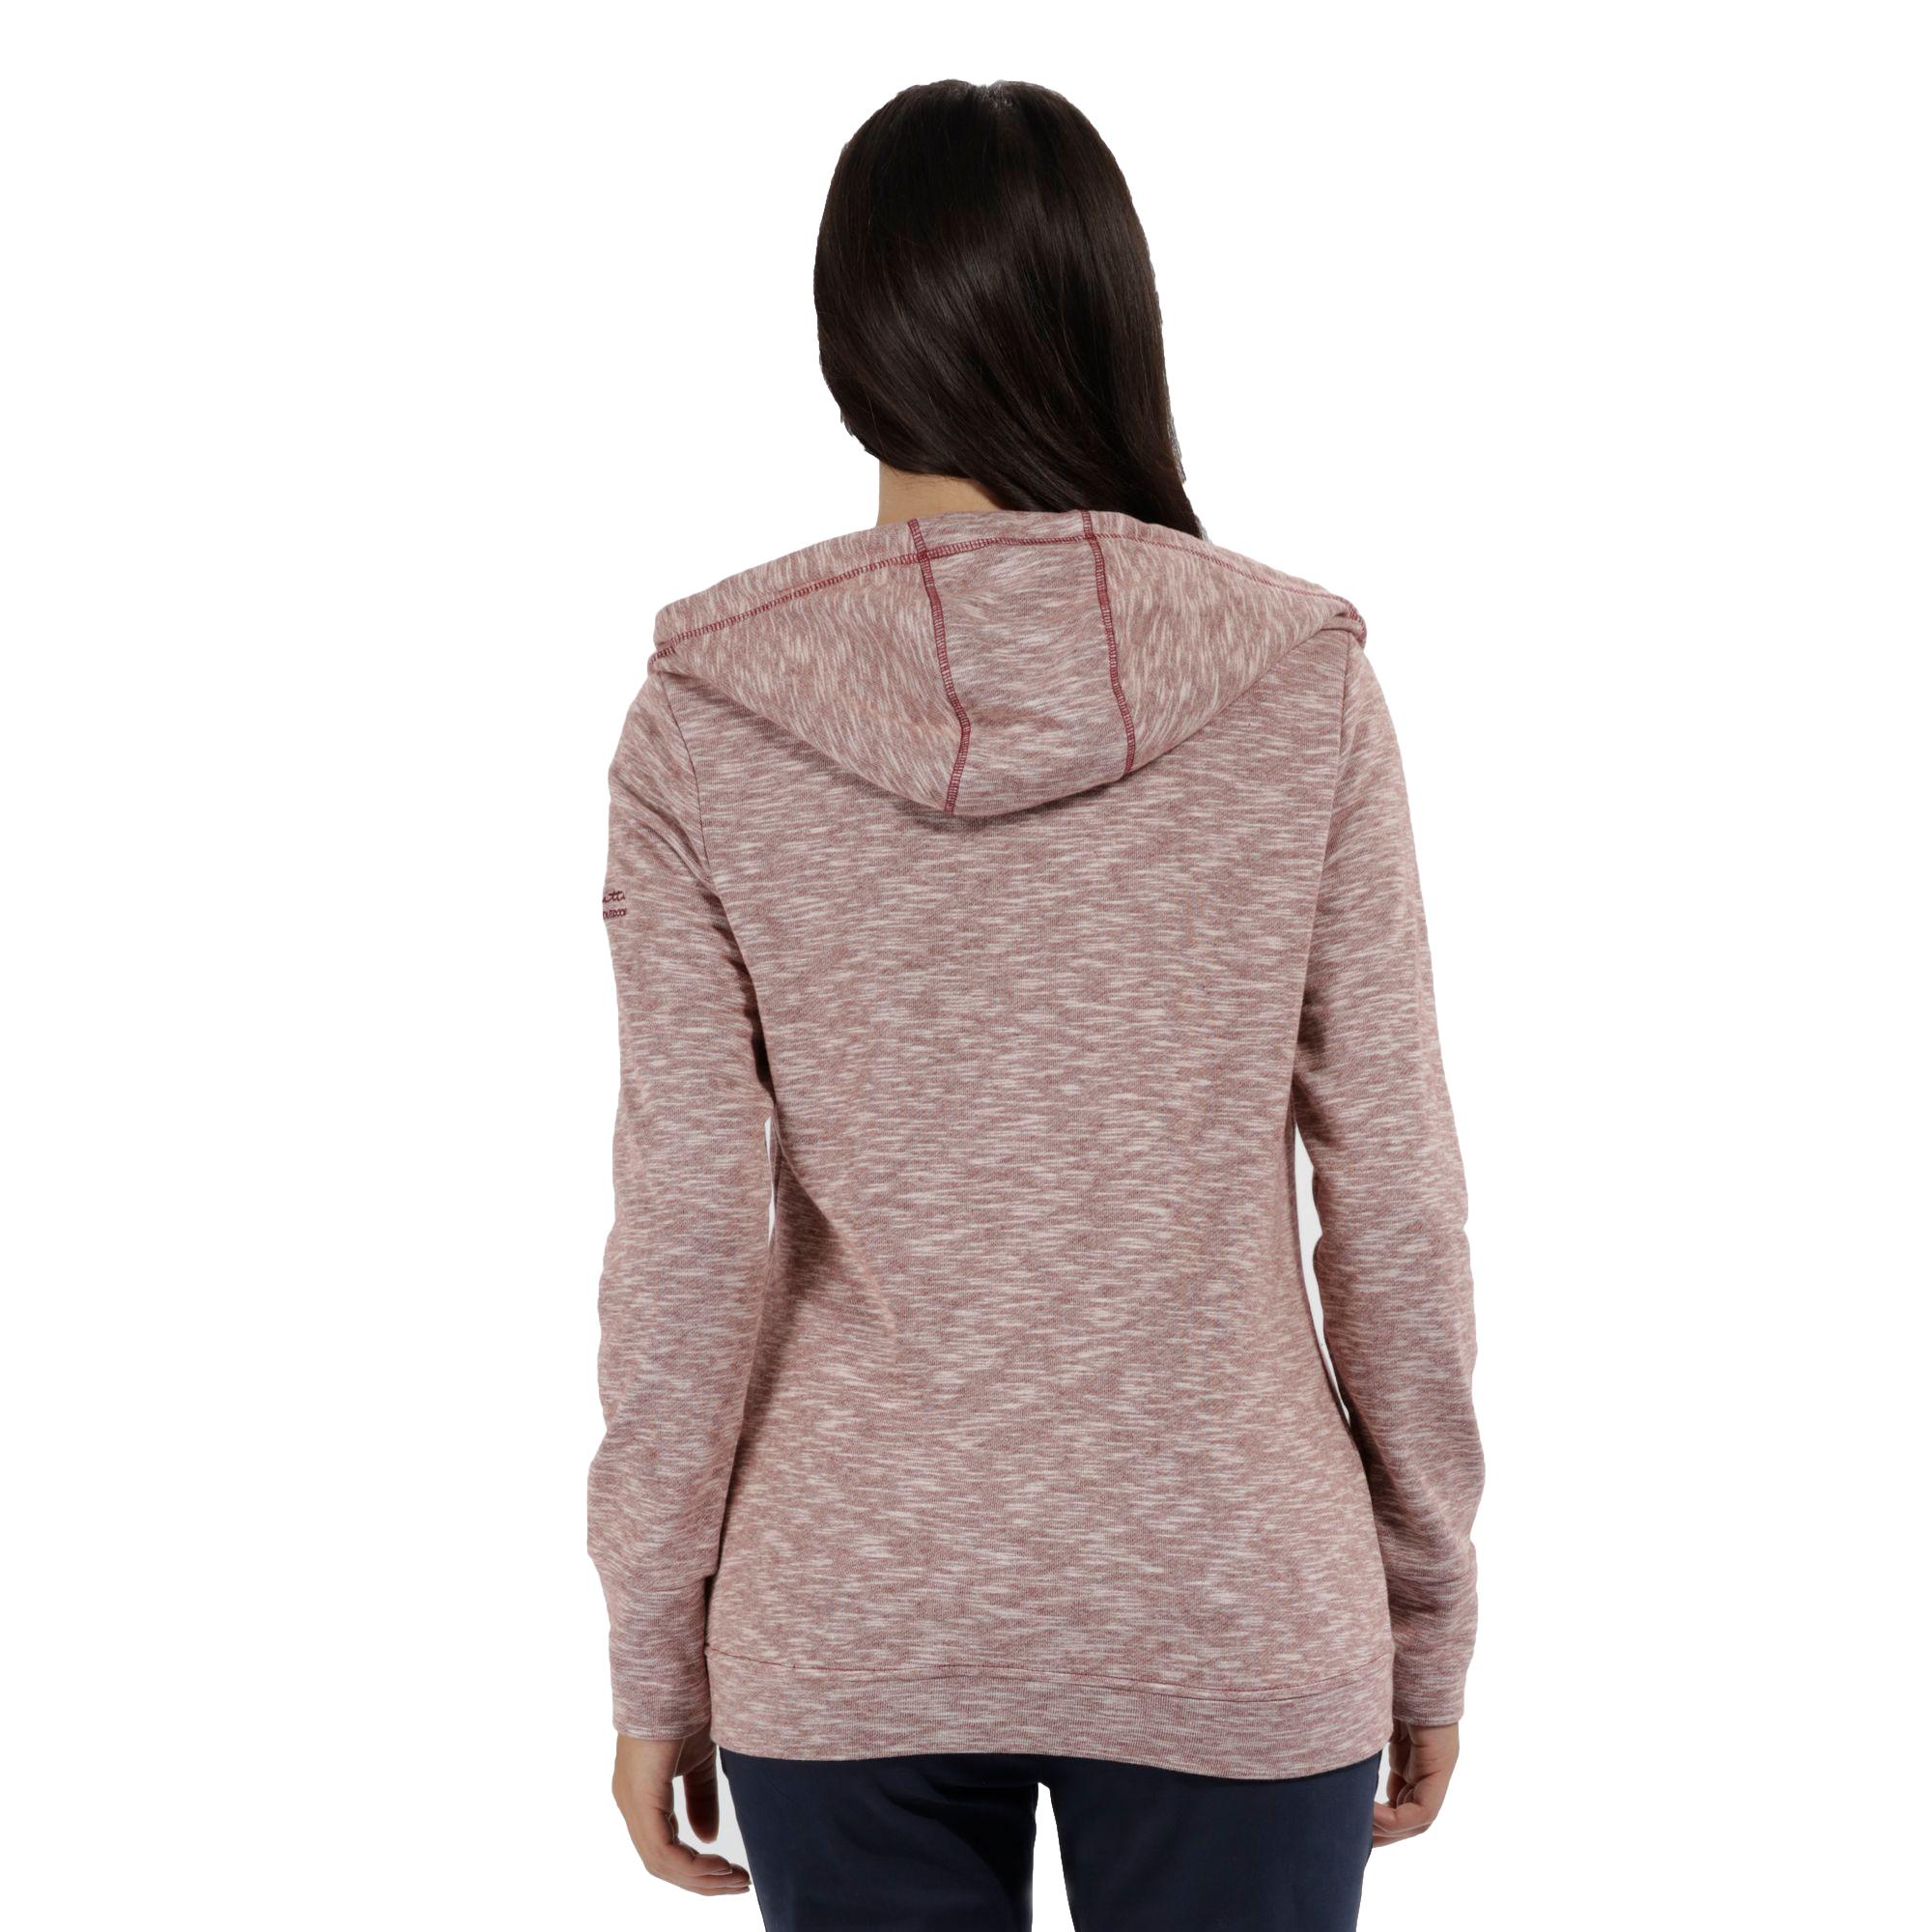 Regatta-Ramosa-Womens-Full-Zip-Hoodie-Hooded-Fleece-Jacket-RRP-50 thumbnail 3